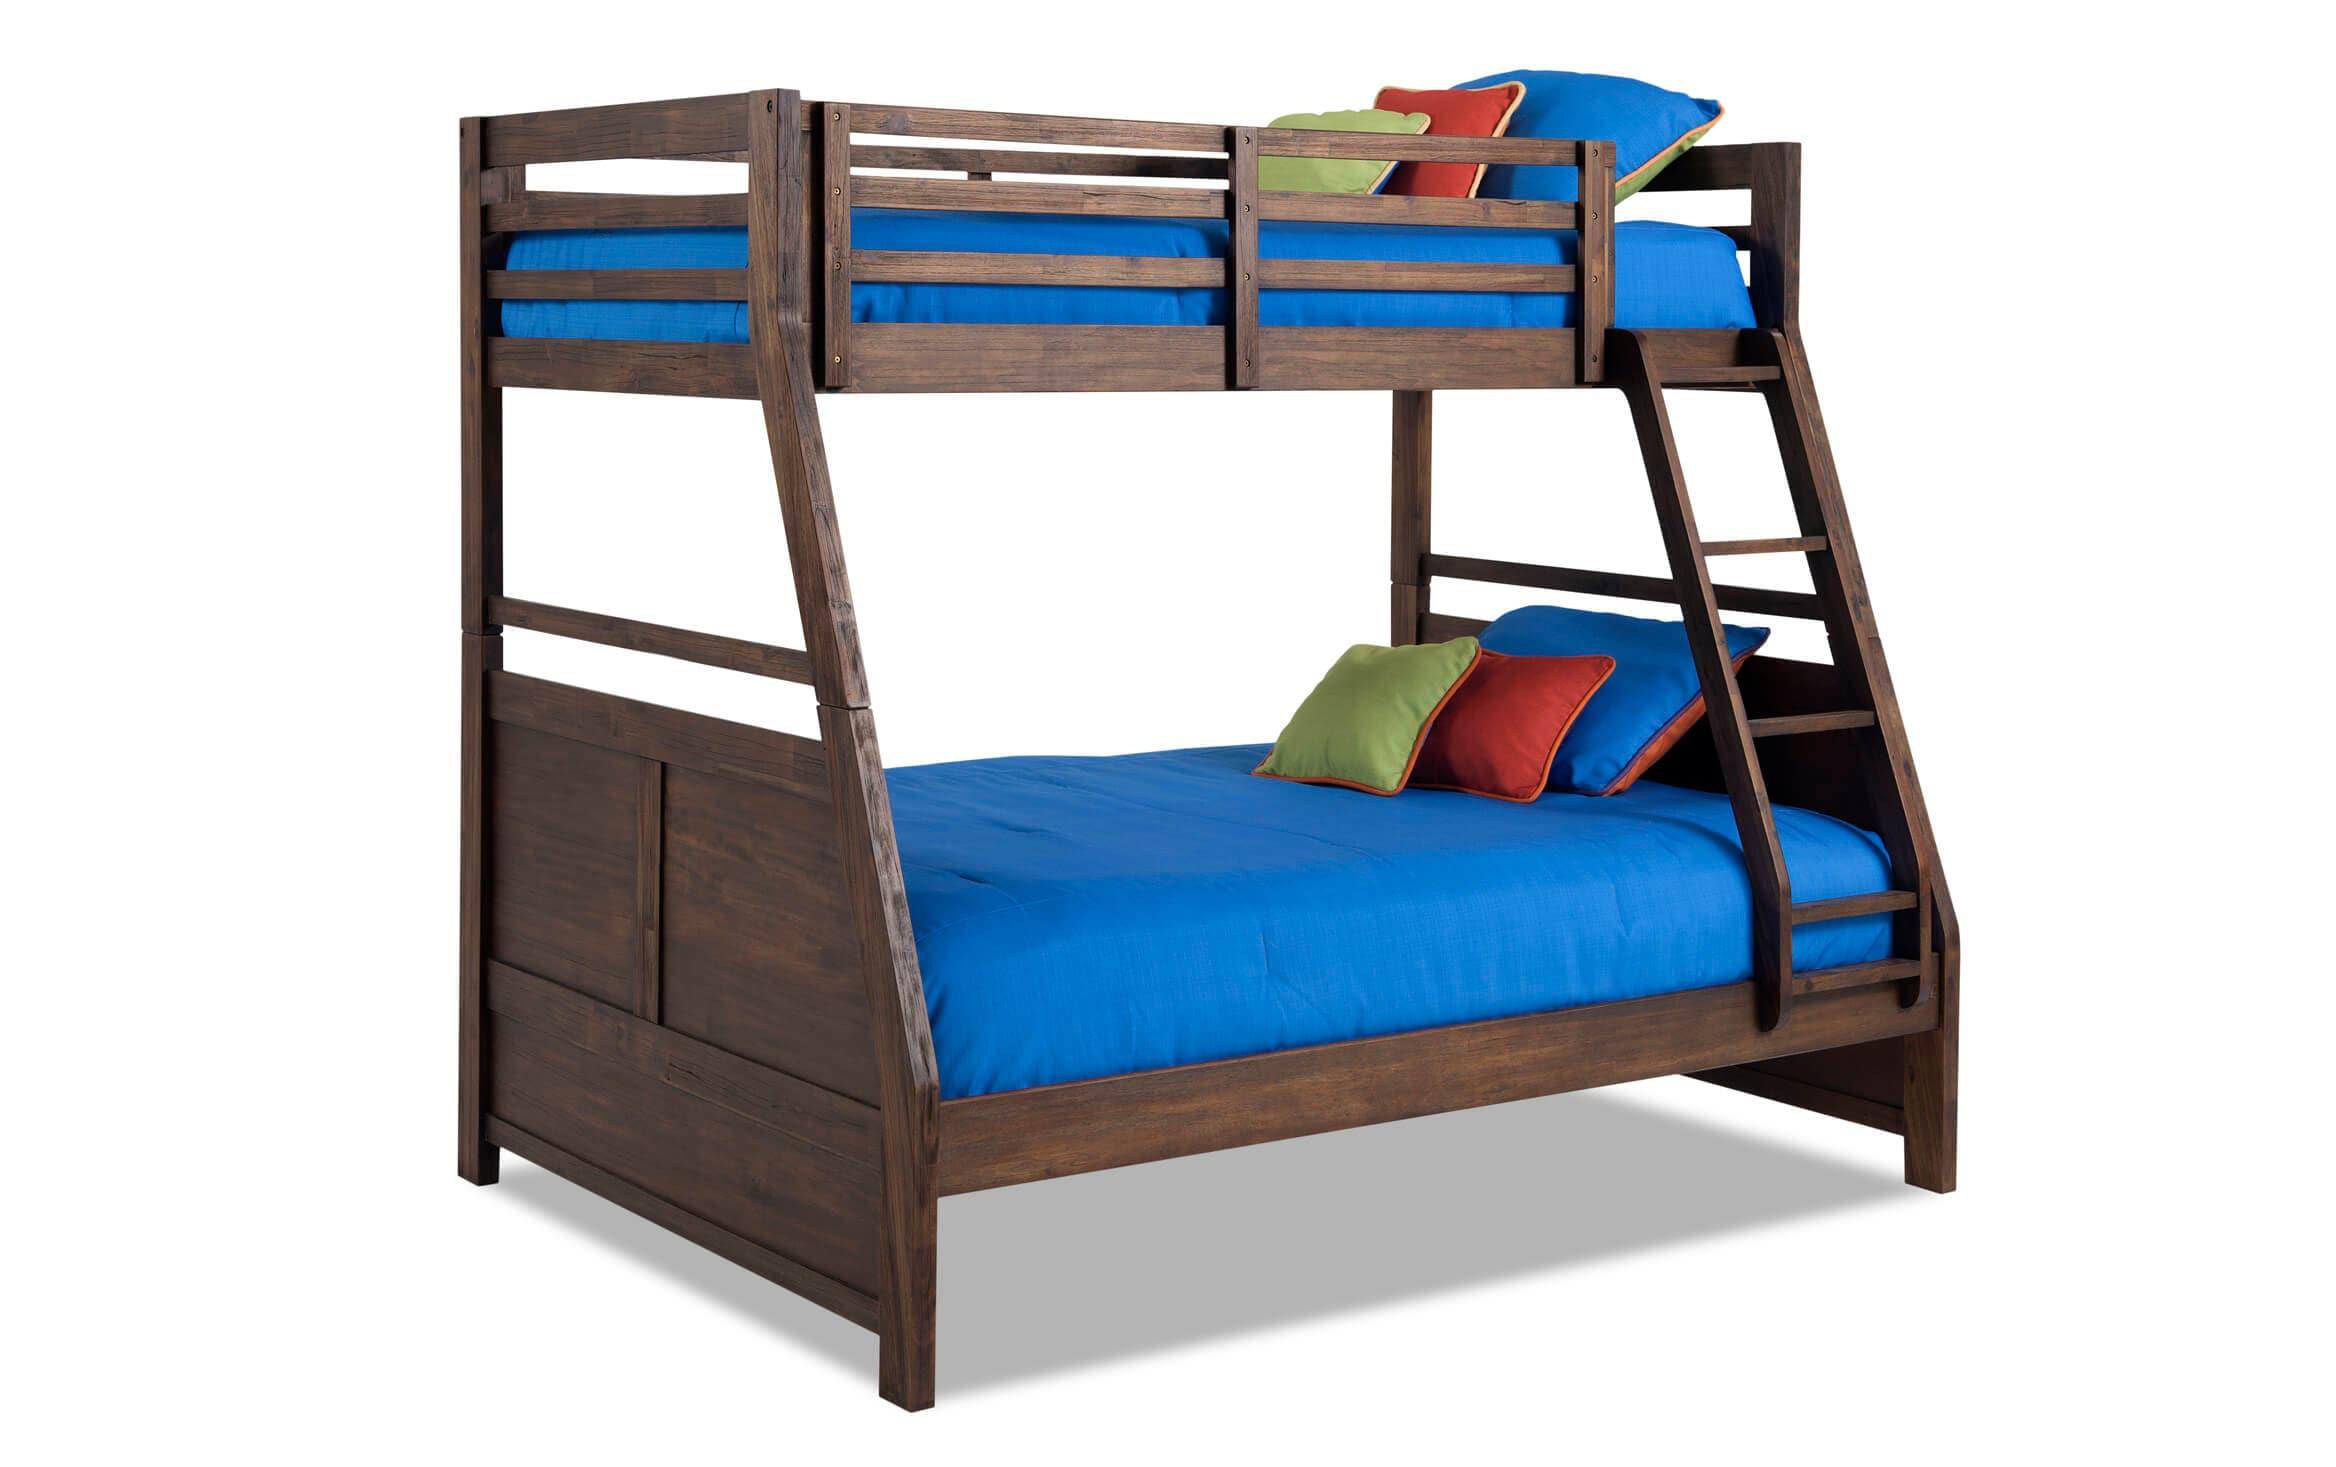 Chadwick Rustic Twin Full Wire Brush Bunk Bed Bob S Discount Furniture